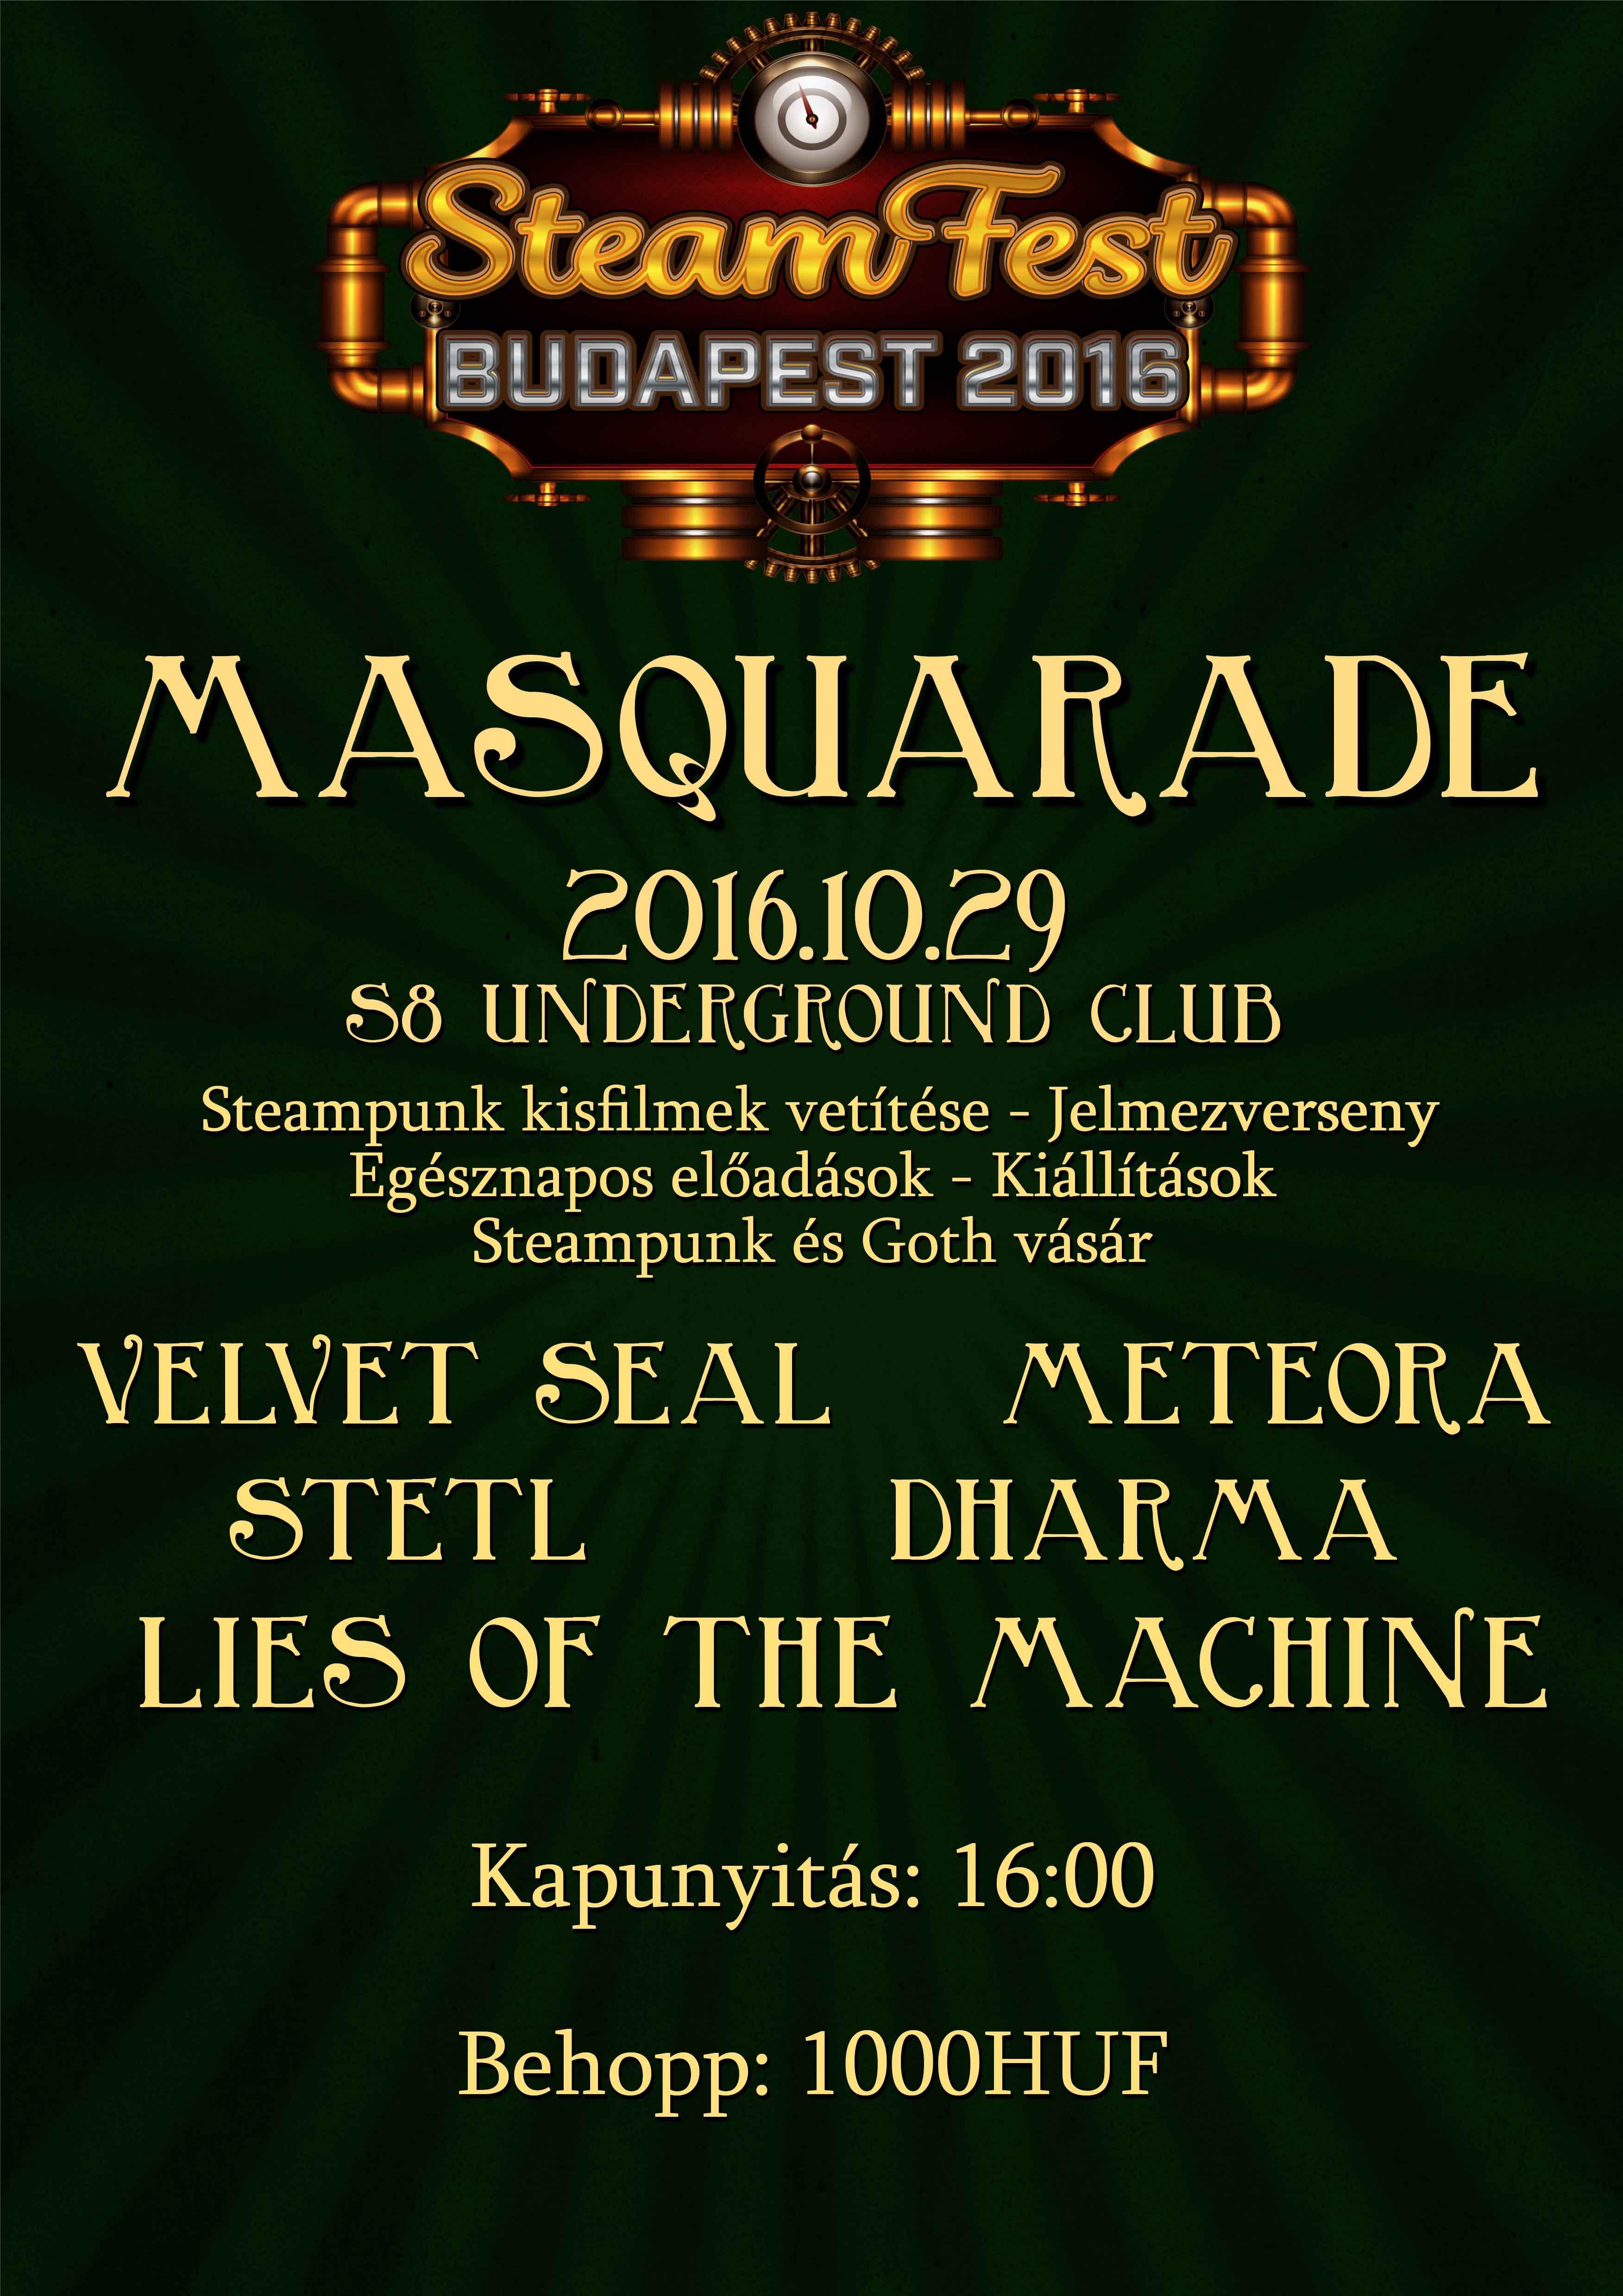 Steamfest 2016